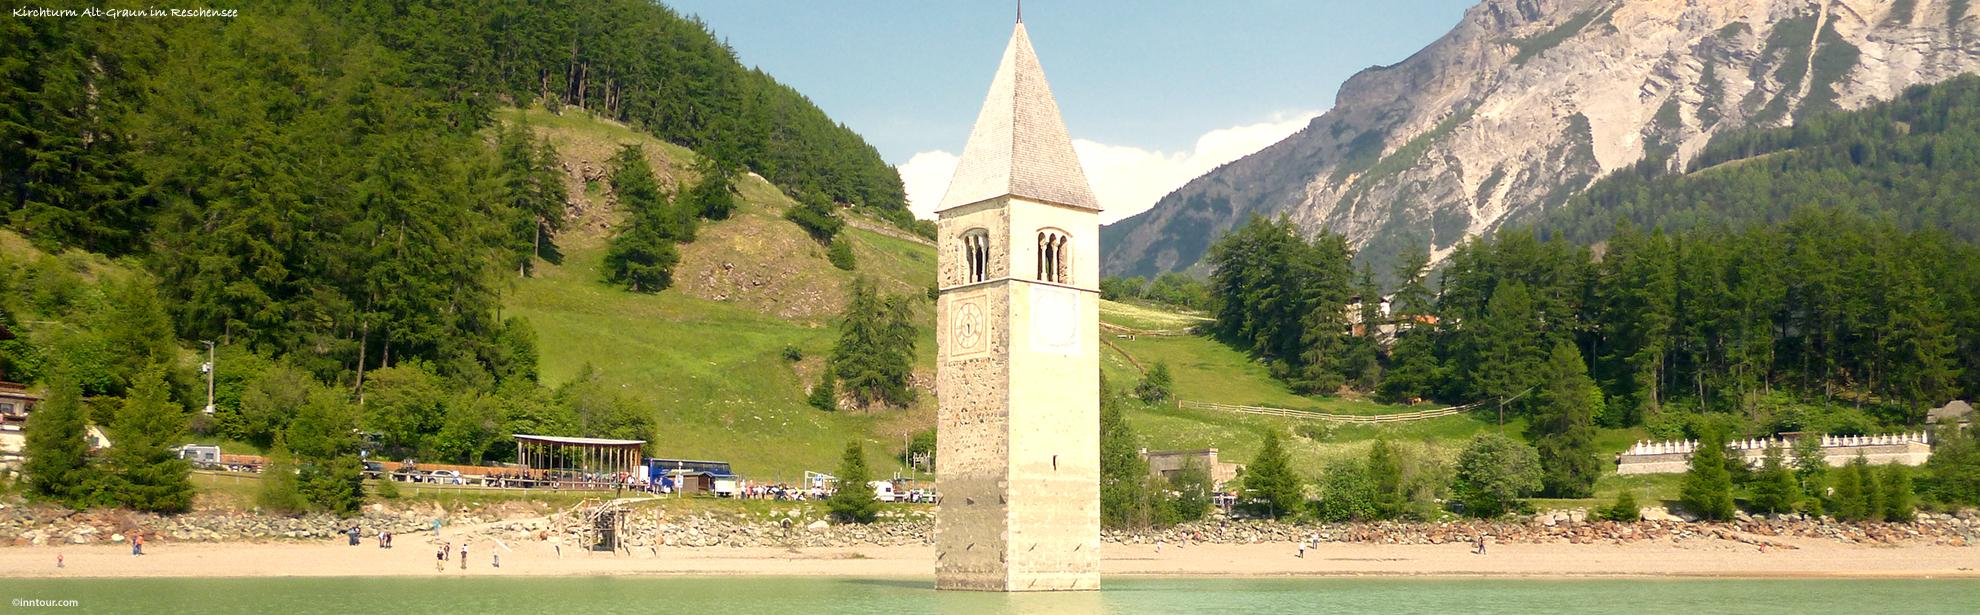 Oklass3inntour_Alt-Graun-im-Reschensee_P1010596